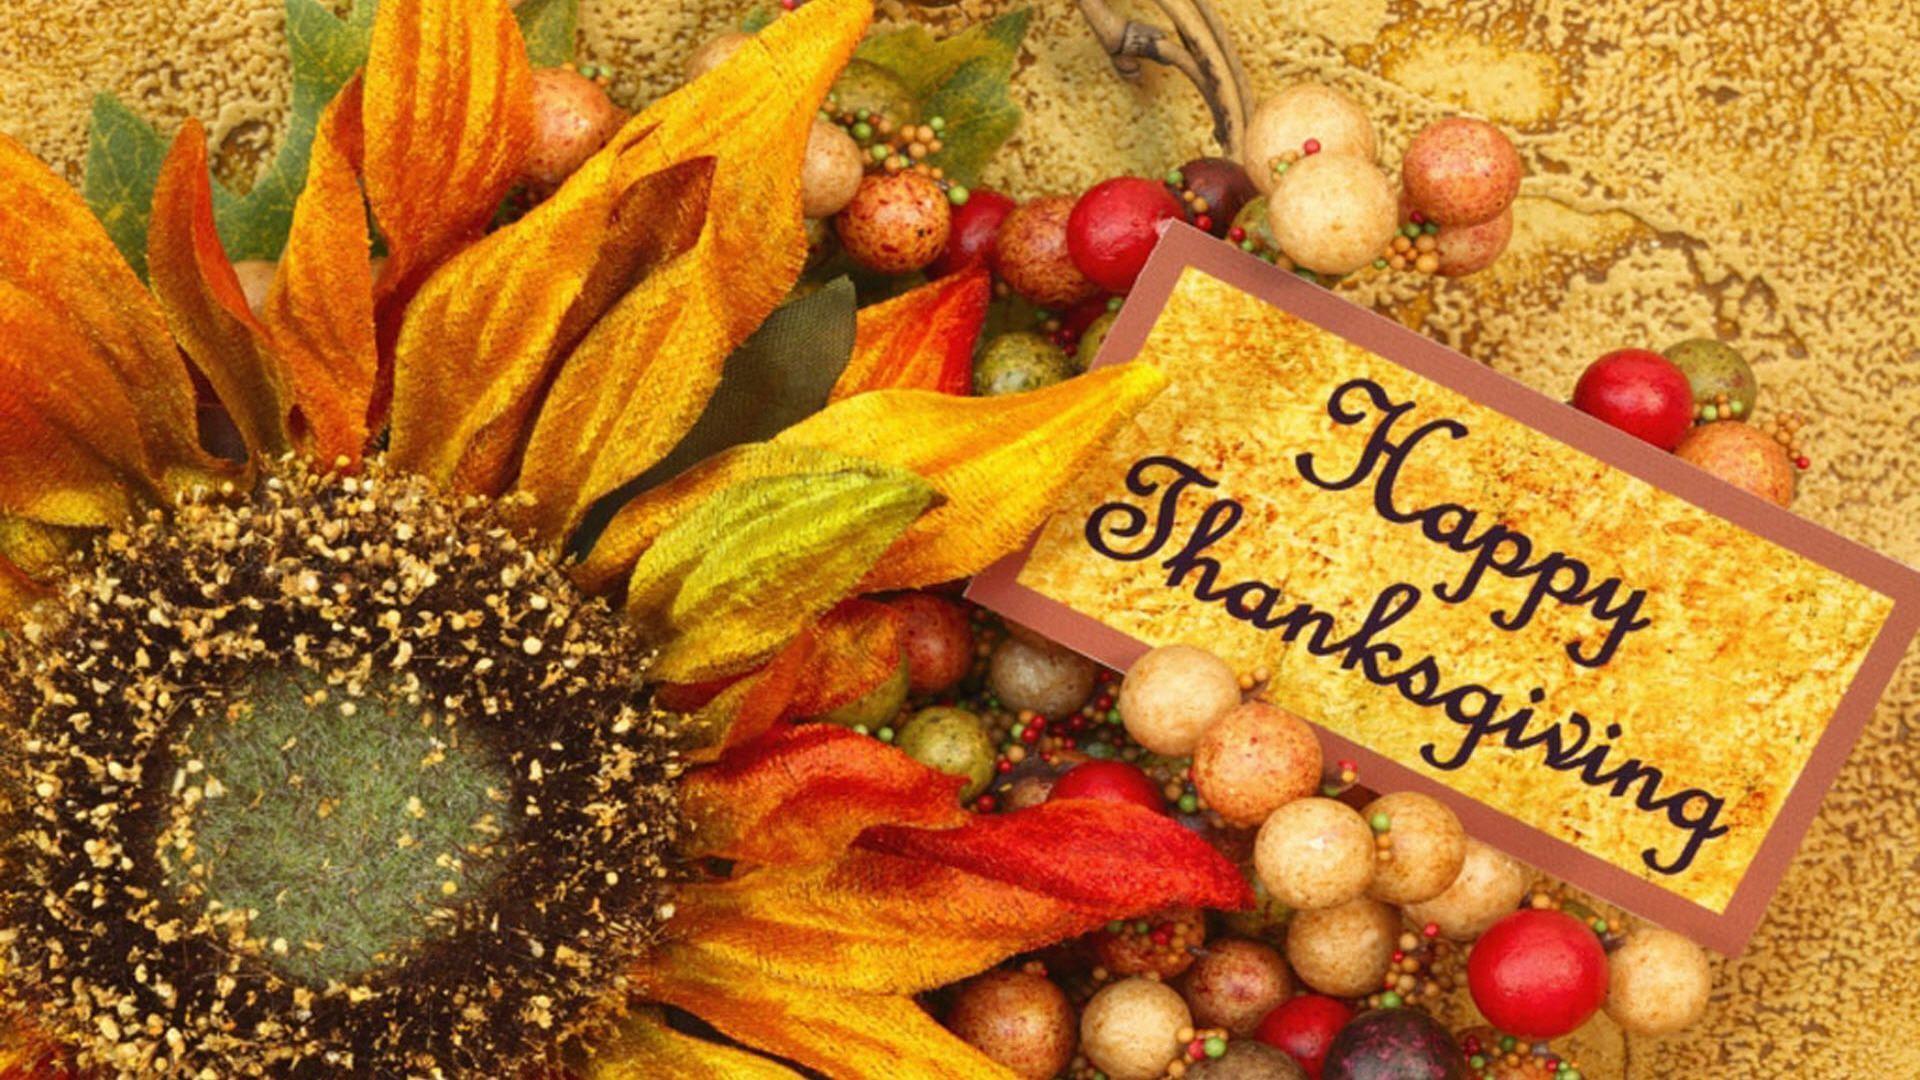 Thanksgiving computer wallpapers wallpaper cave - Wallpaper desktop thanksgiving ...